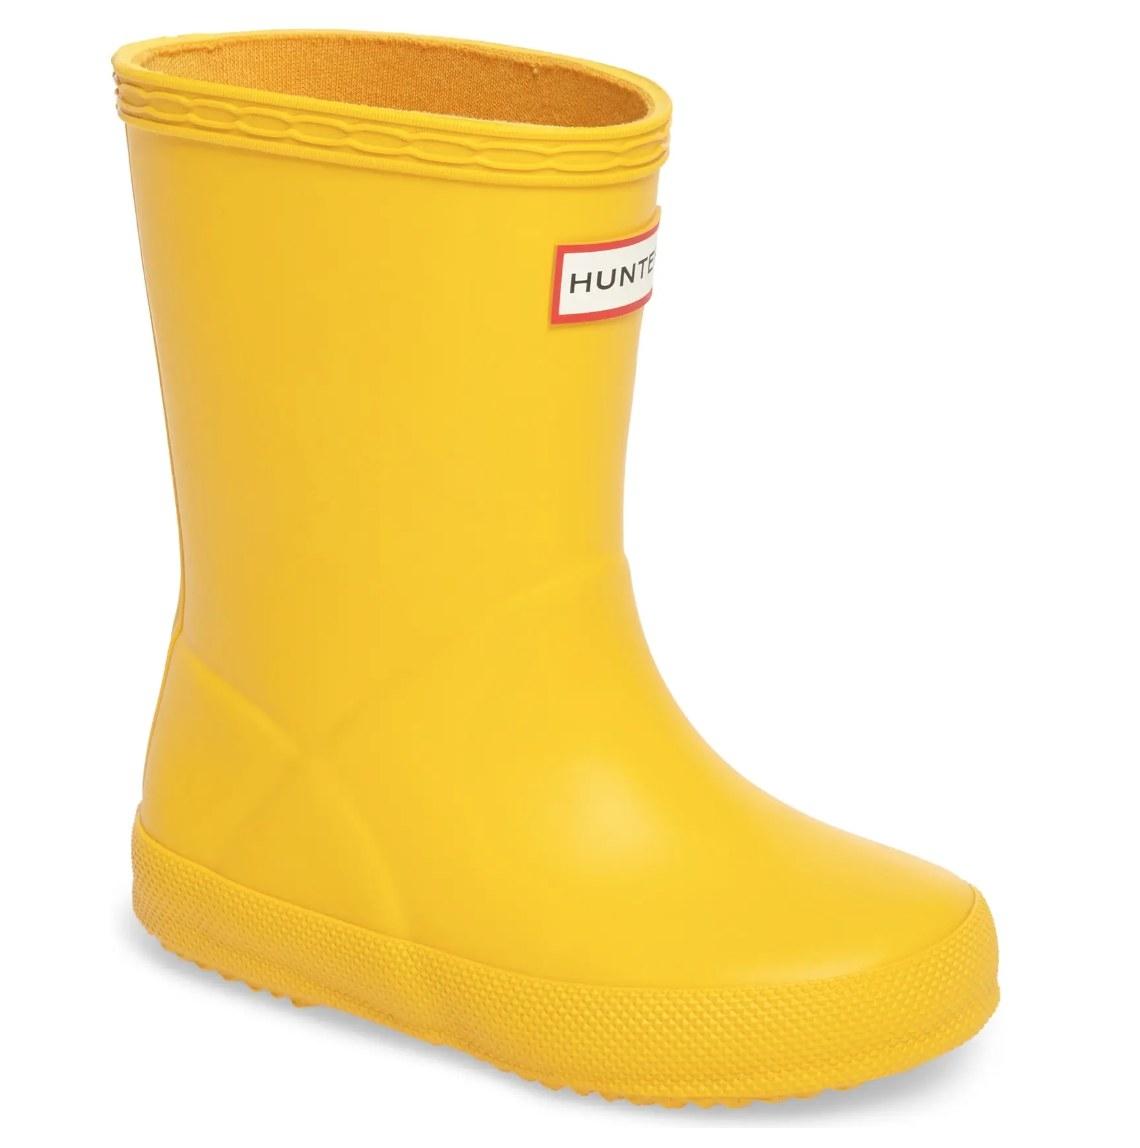 The yellow Hunter Rain Boots